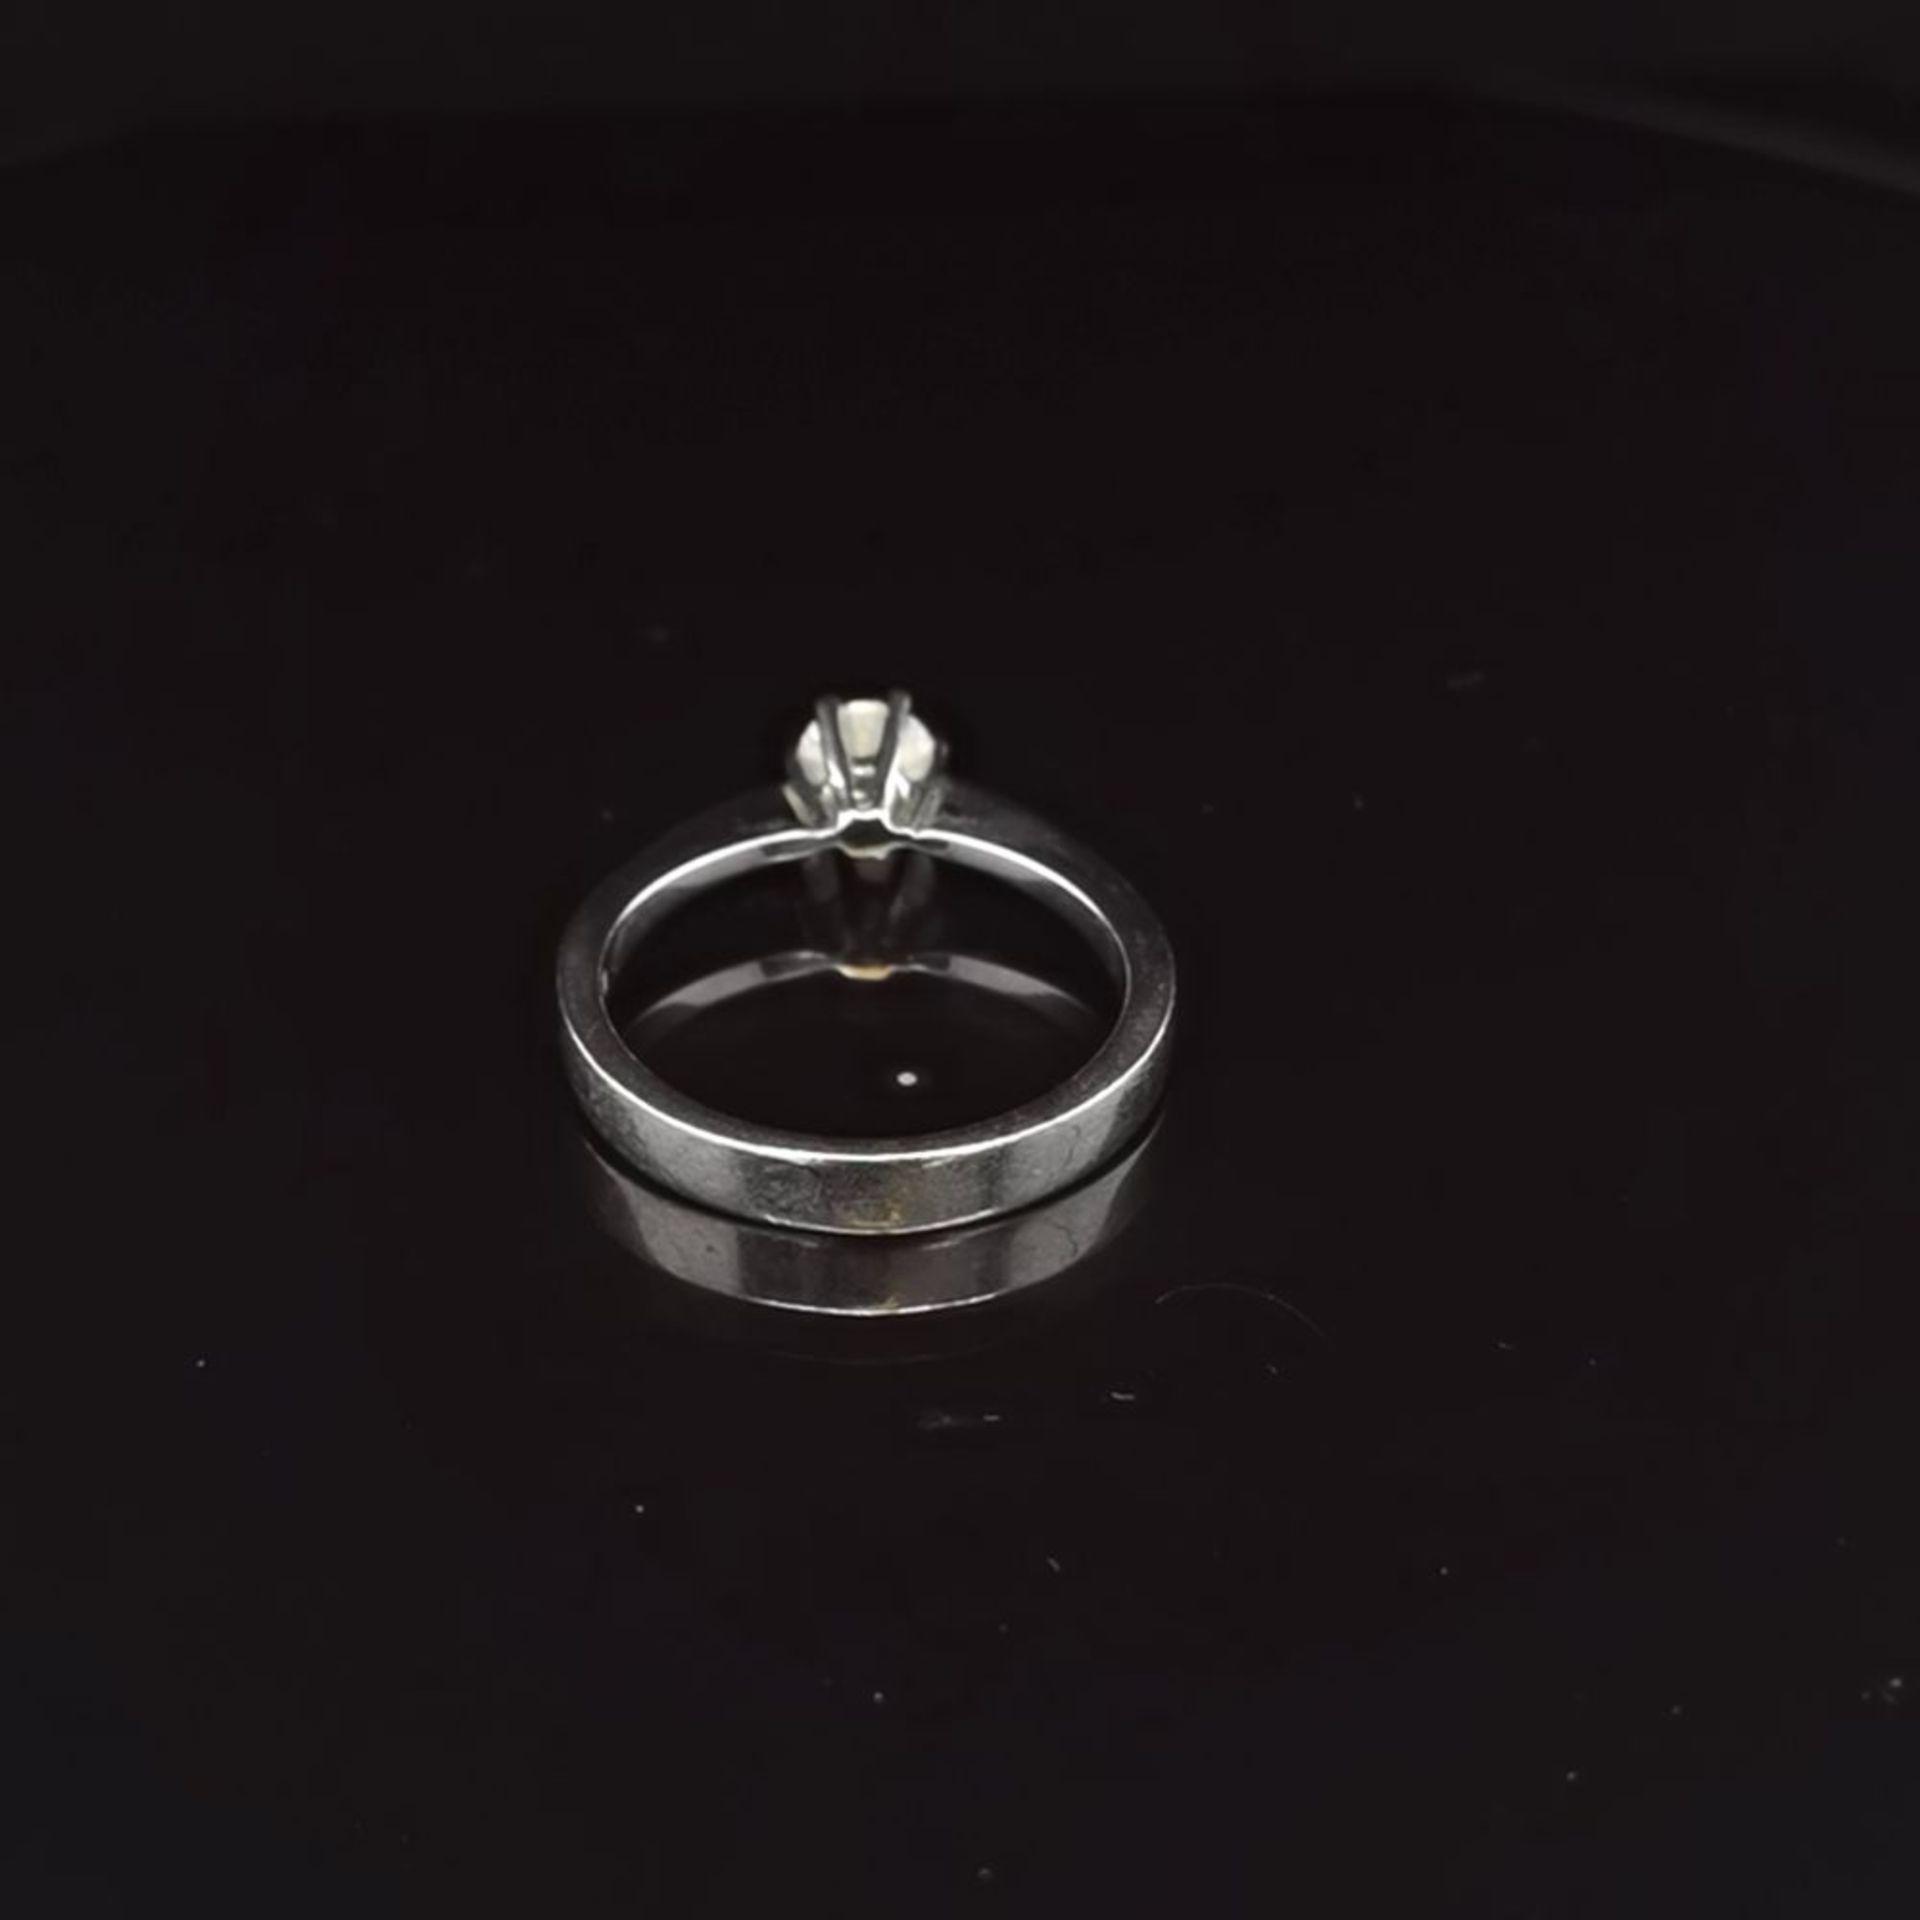 Brillant-Ring, 750 Weißgold 3,4 - Image 3 of 3